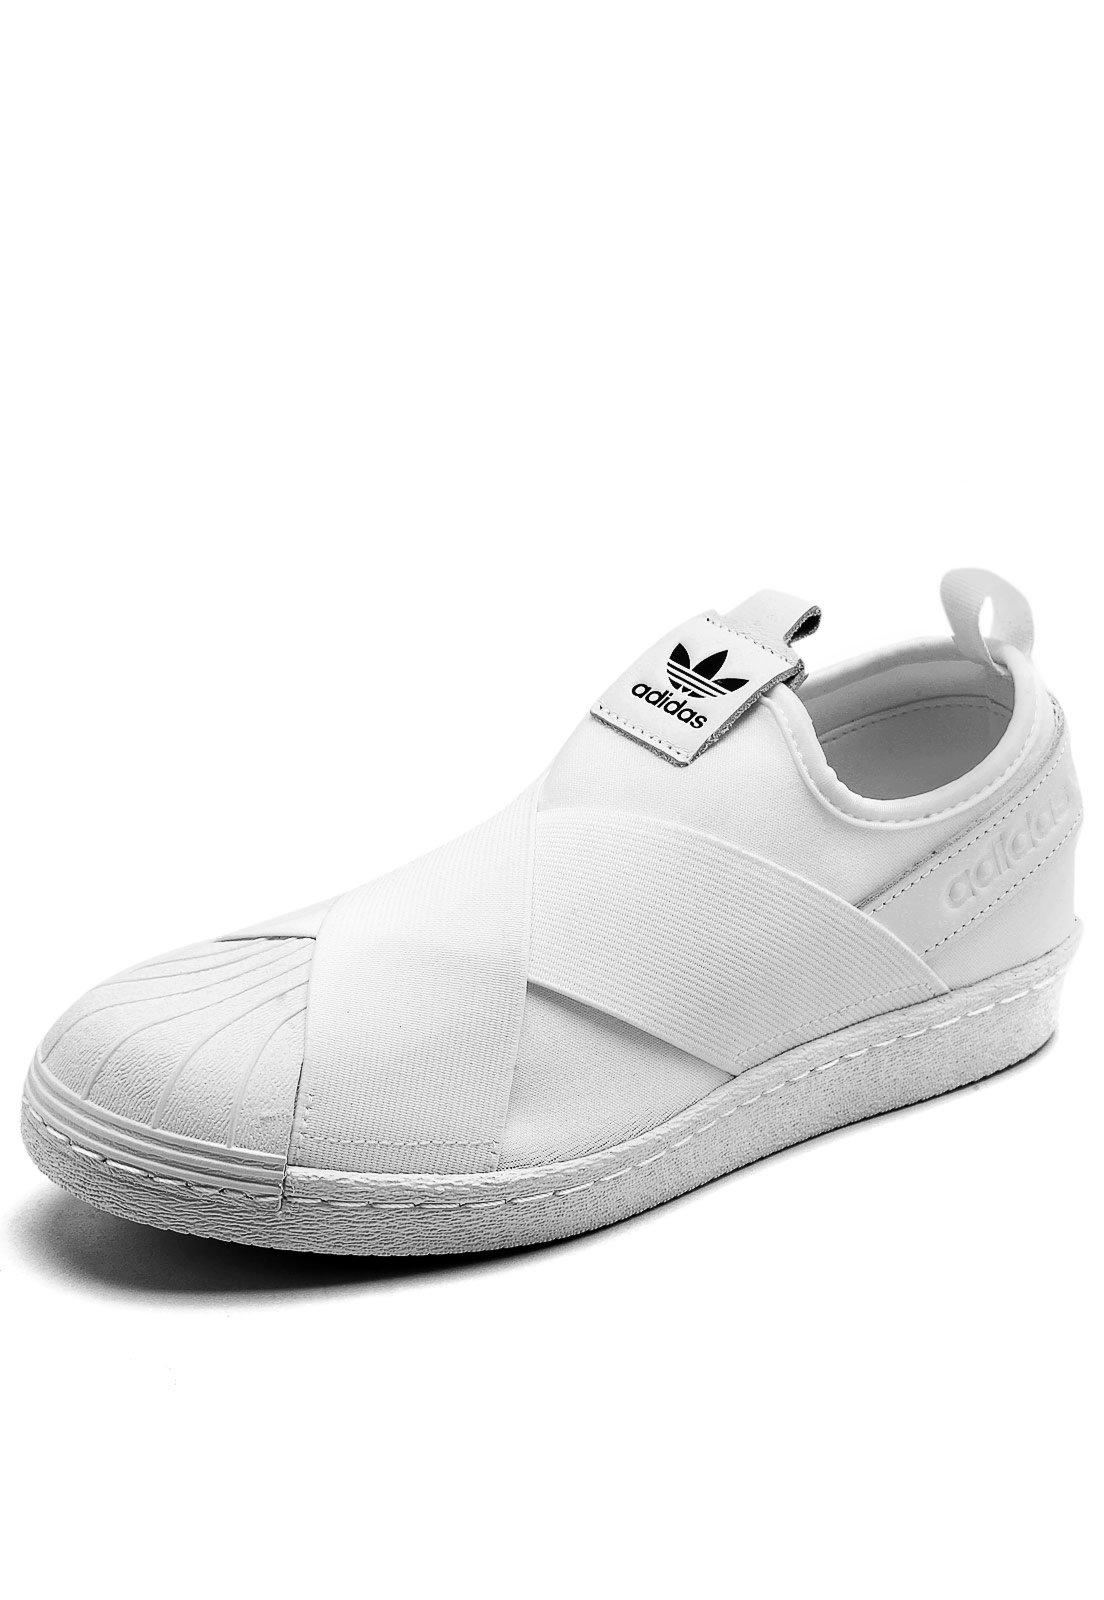 Tênis adidas Originals Superstar Slip on W Branco